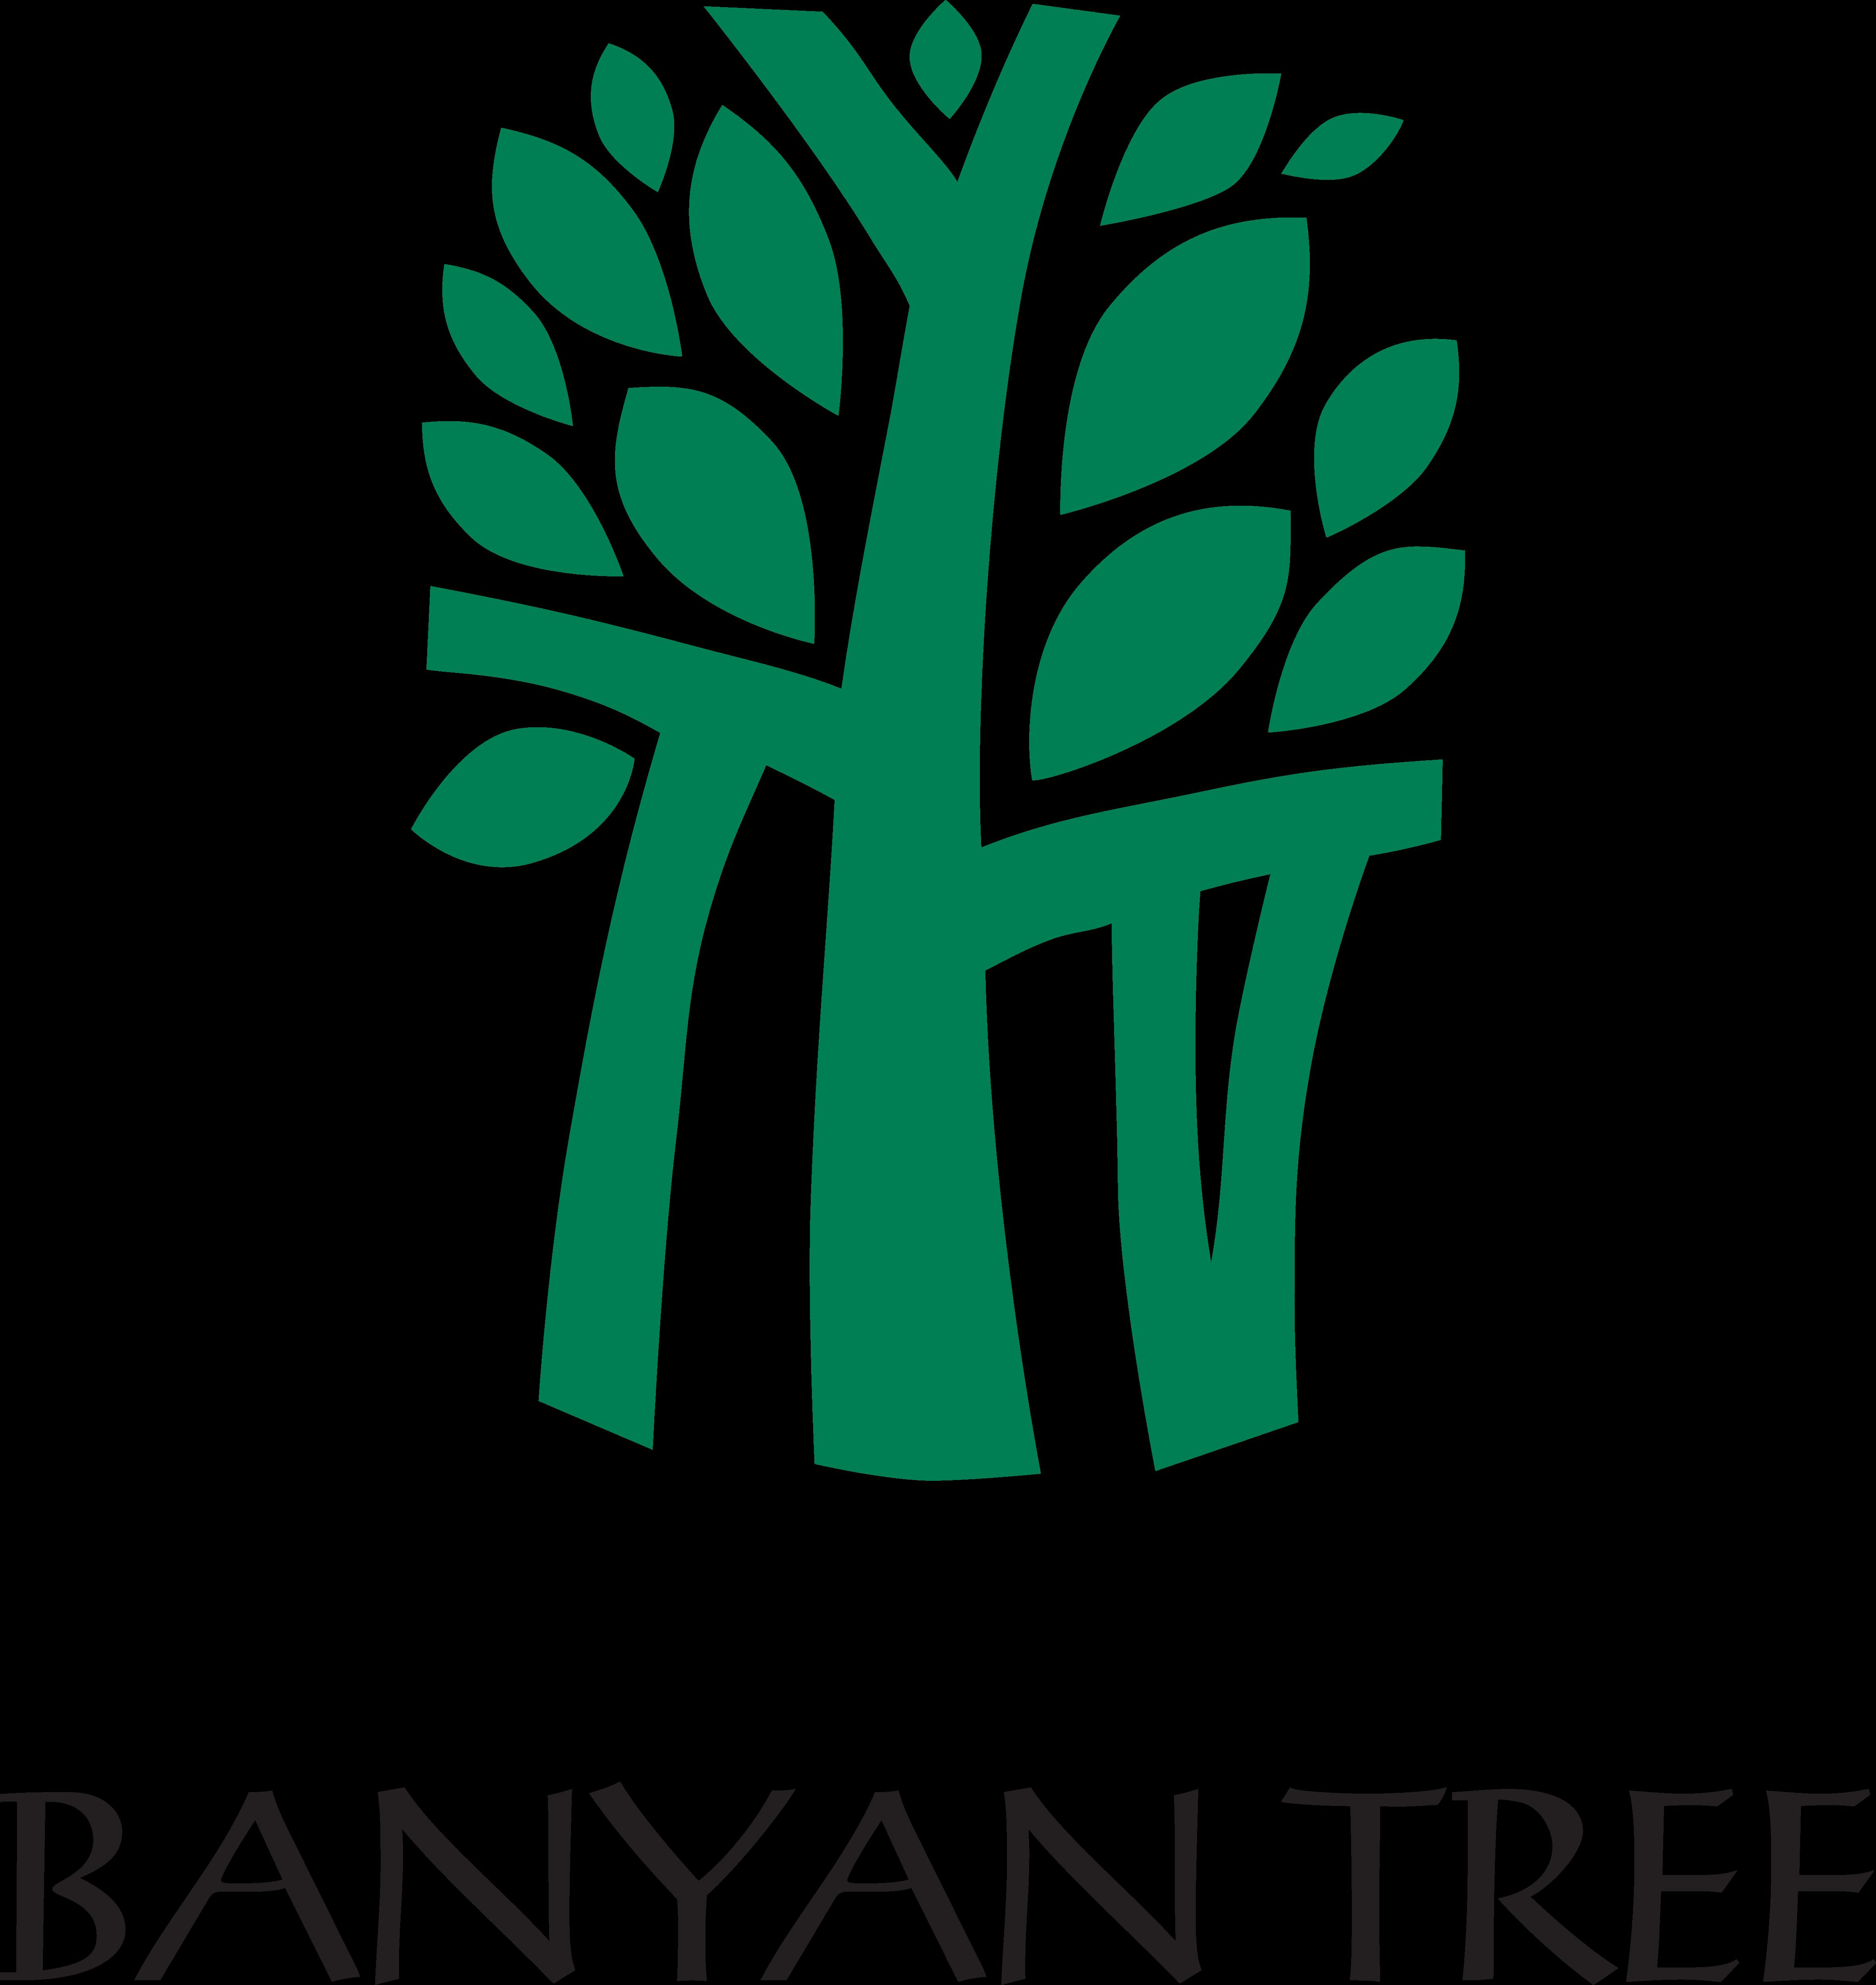 https://logos-download.com/wp-content/uploads/2016/09/Banyan_Tree_logo.png